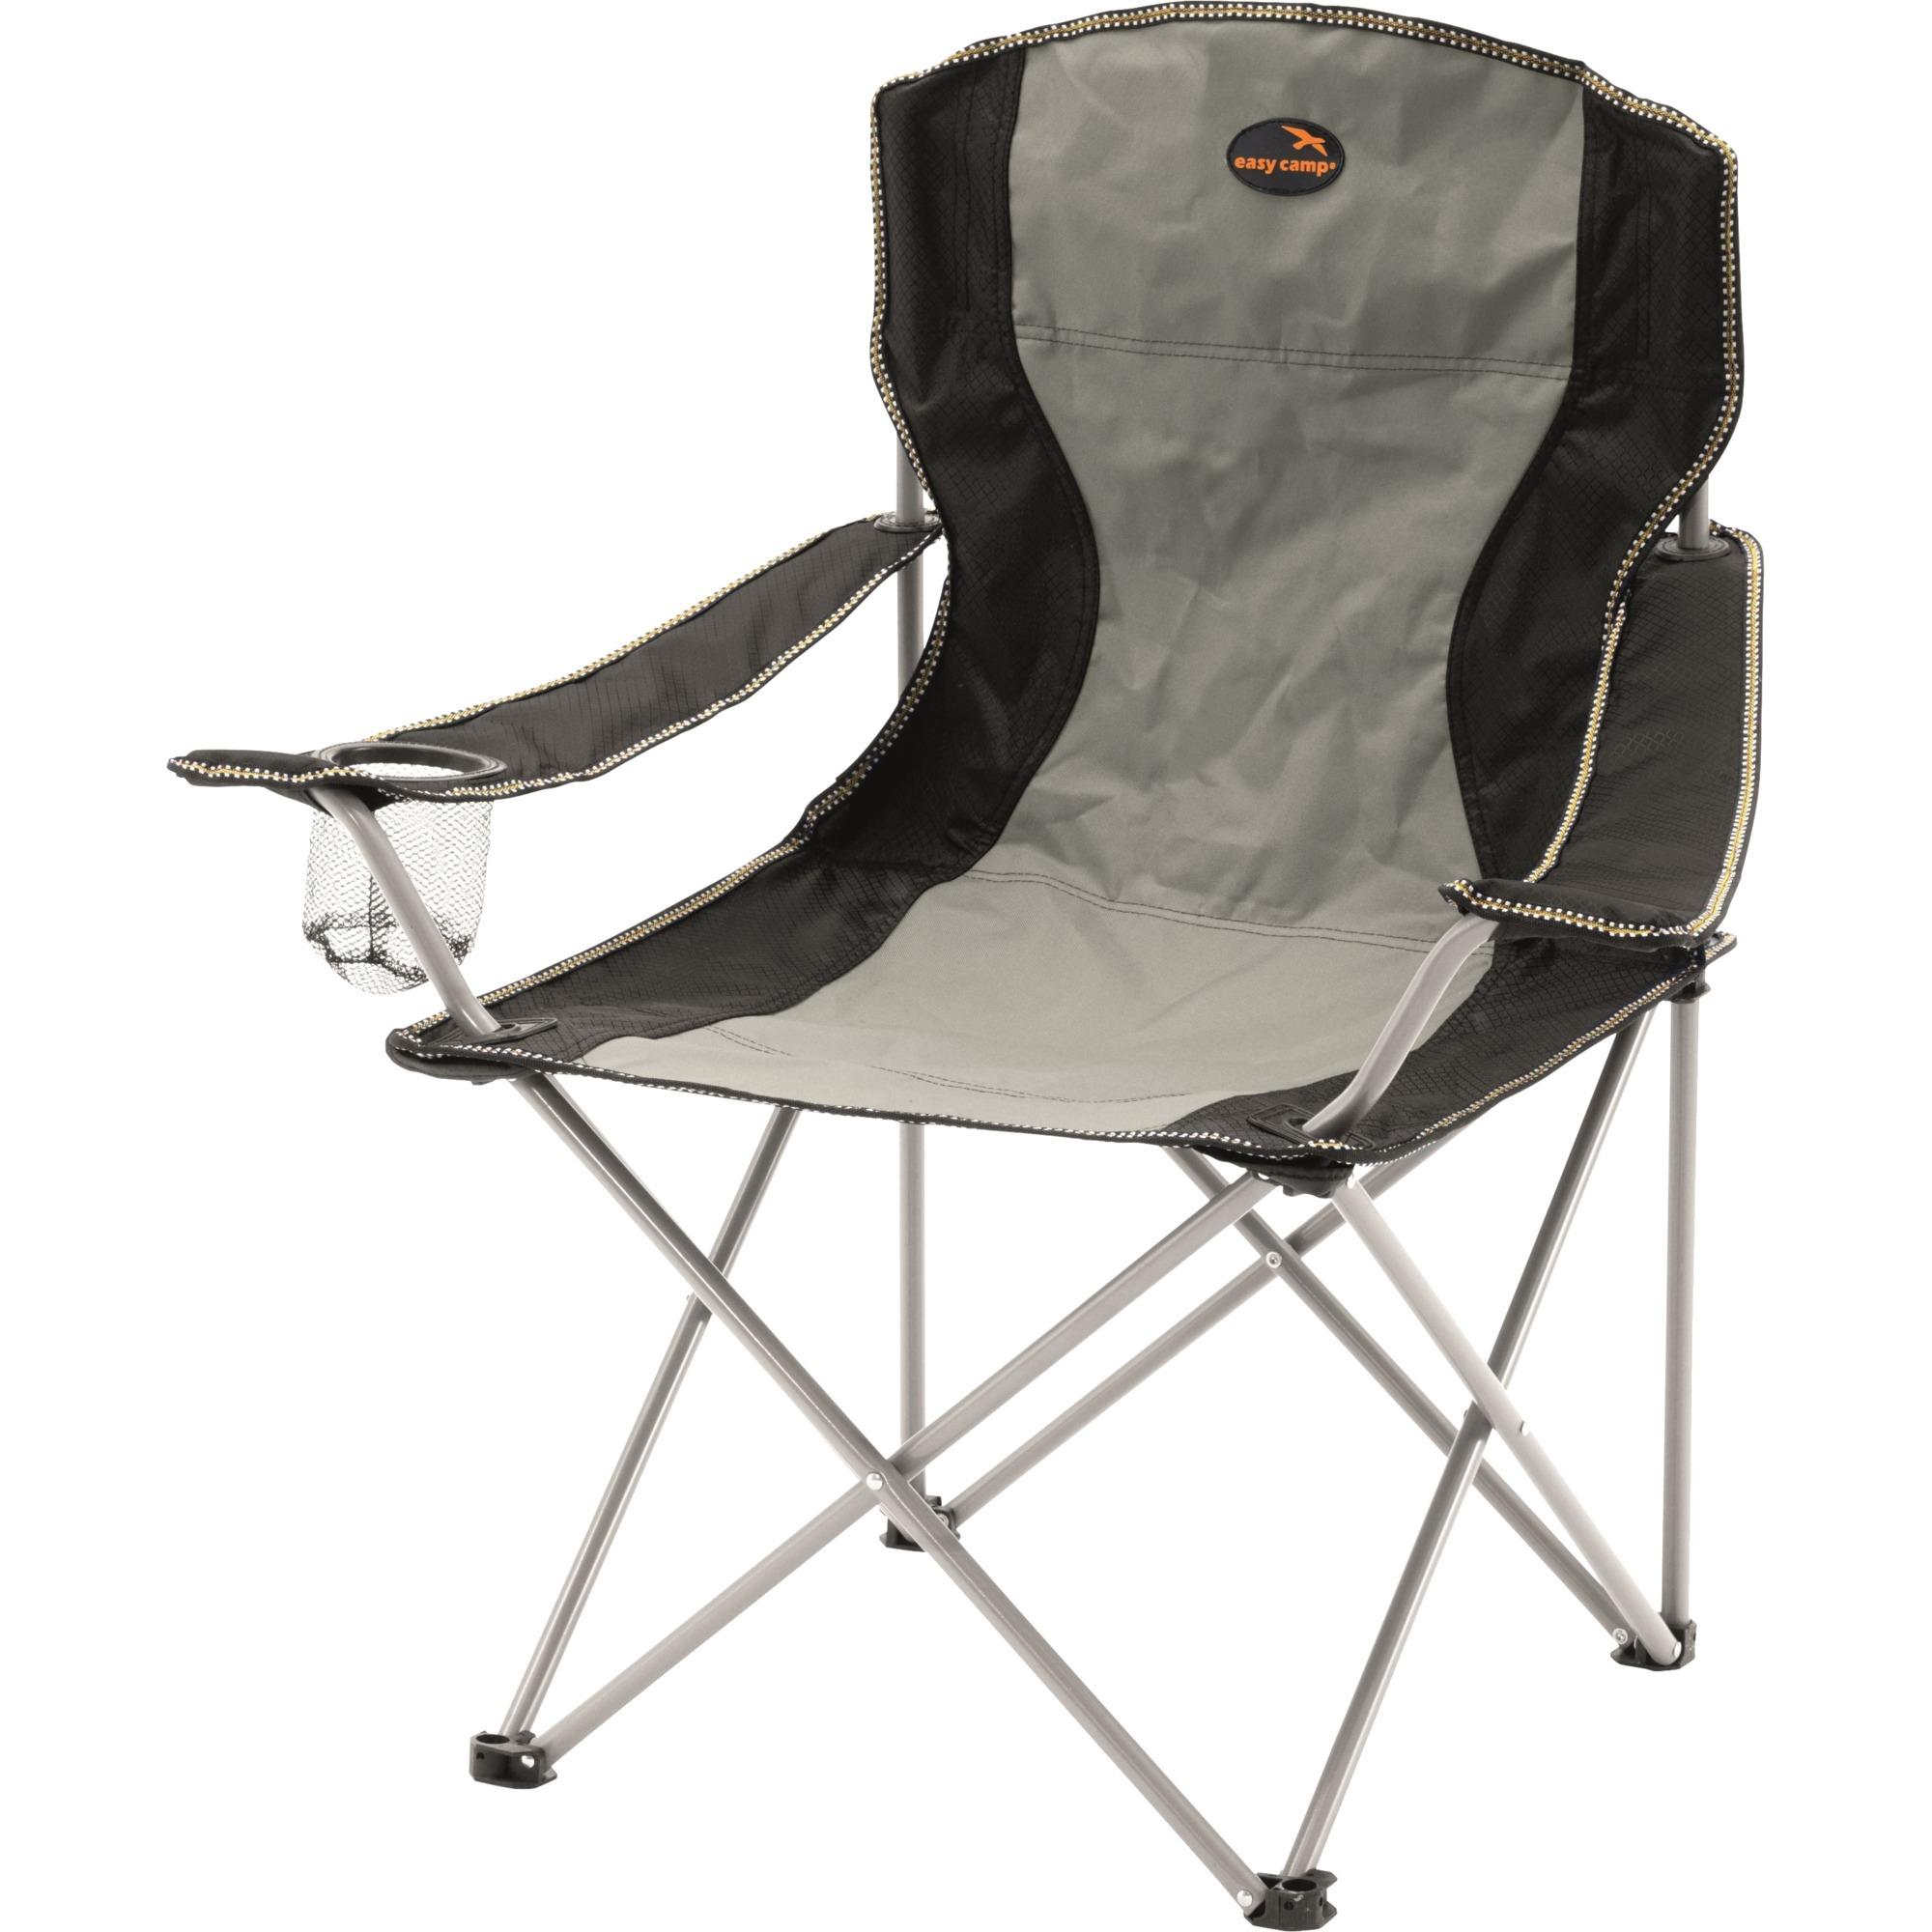 480021 Camping chair 4leg(s) Grå campingstol